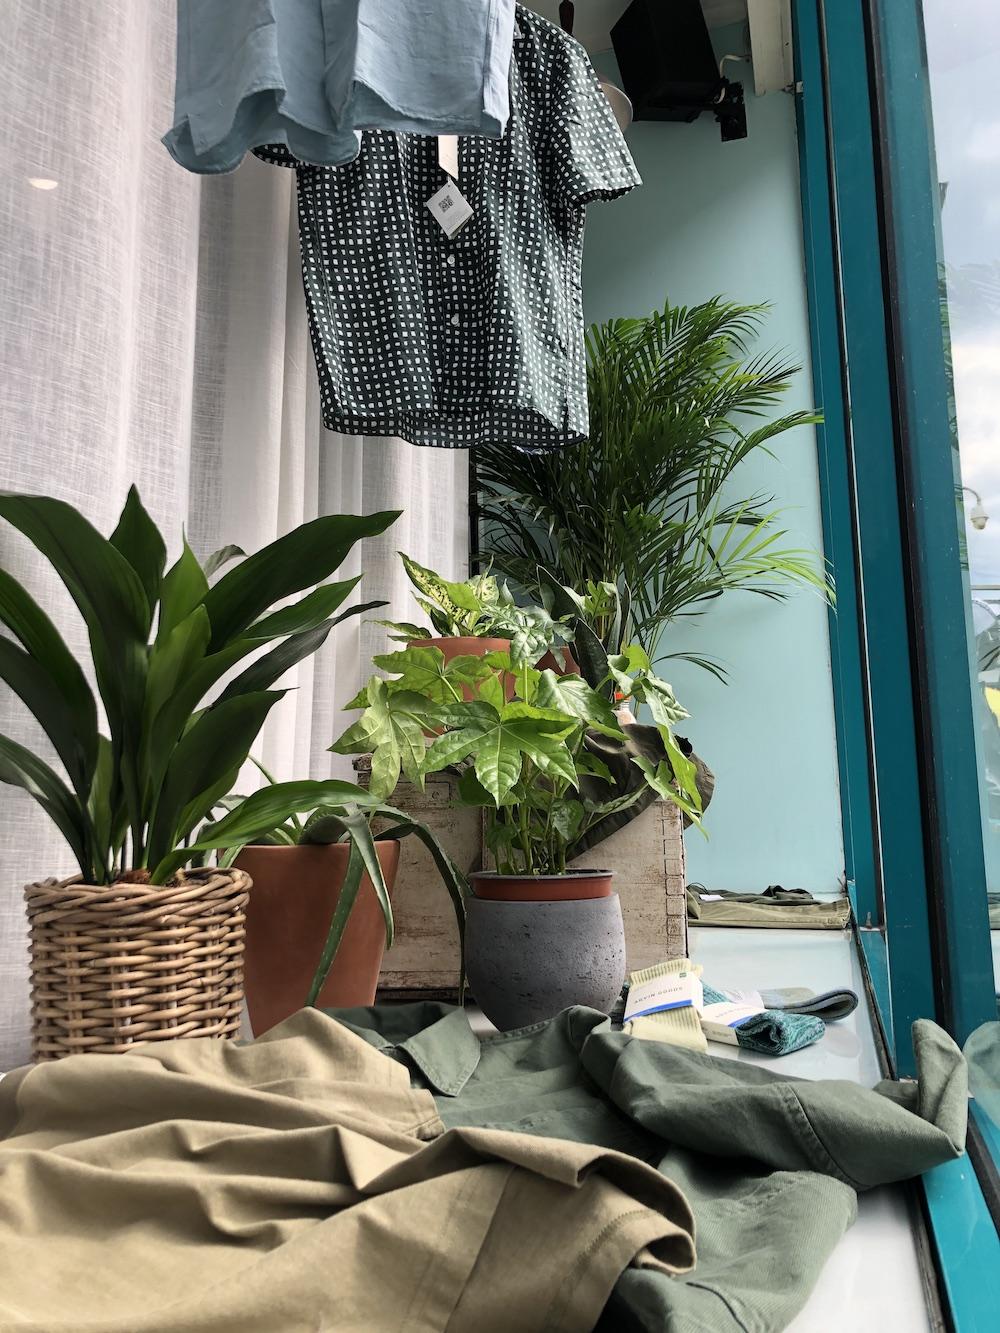 spring 2021 tonic portobello back to nature window display